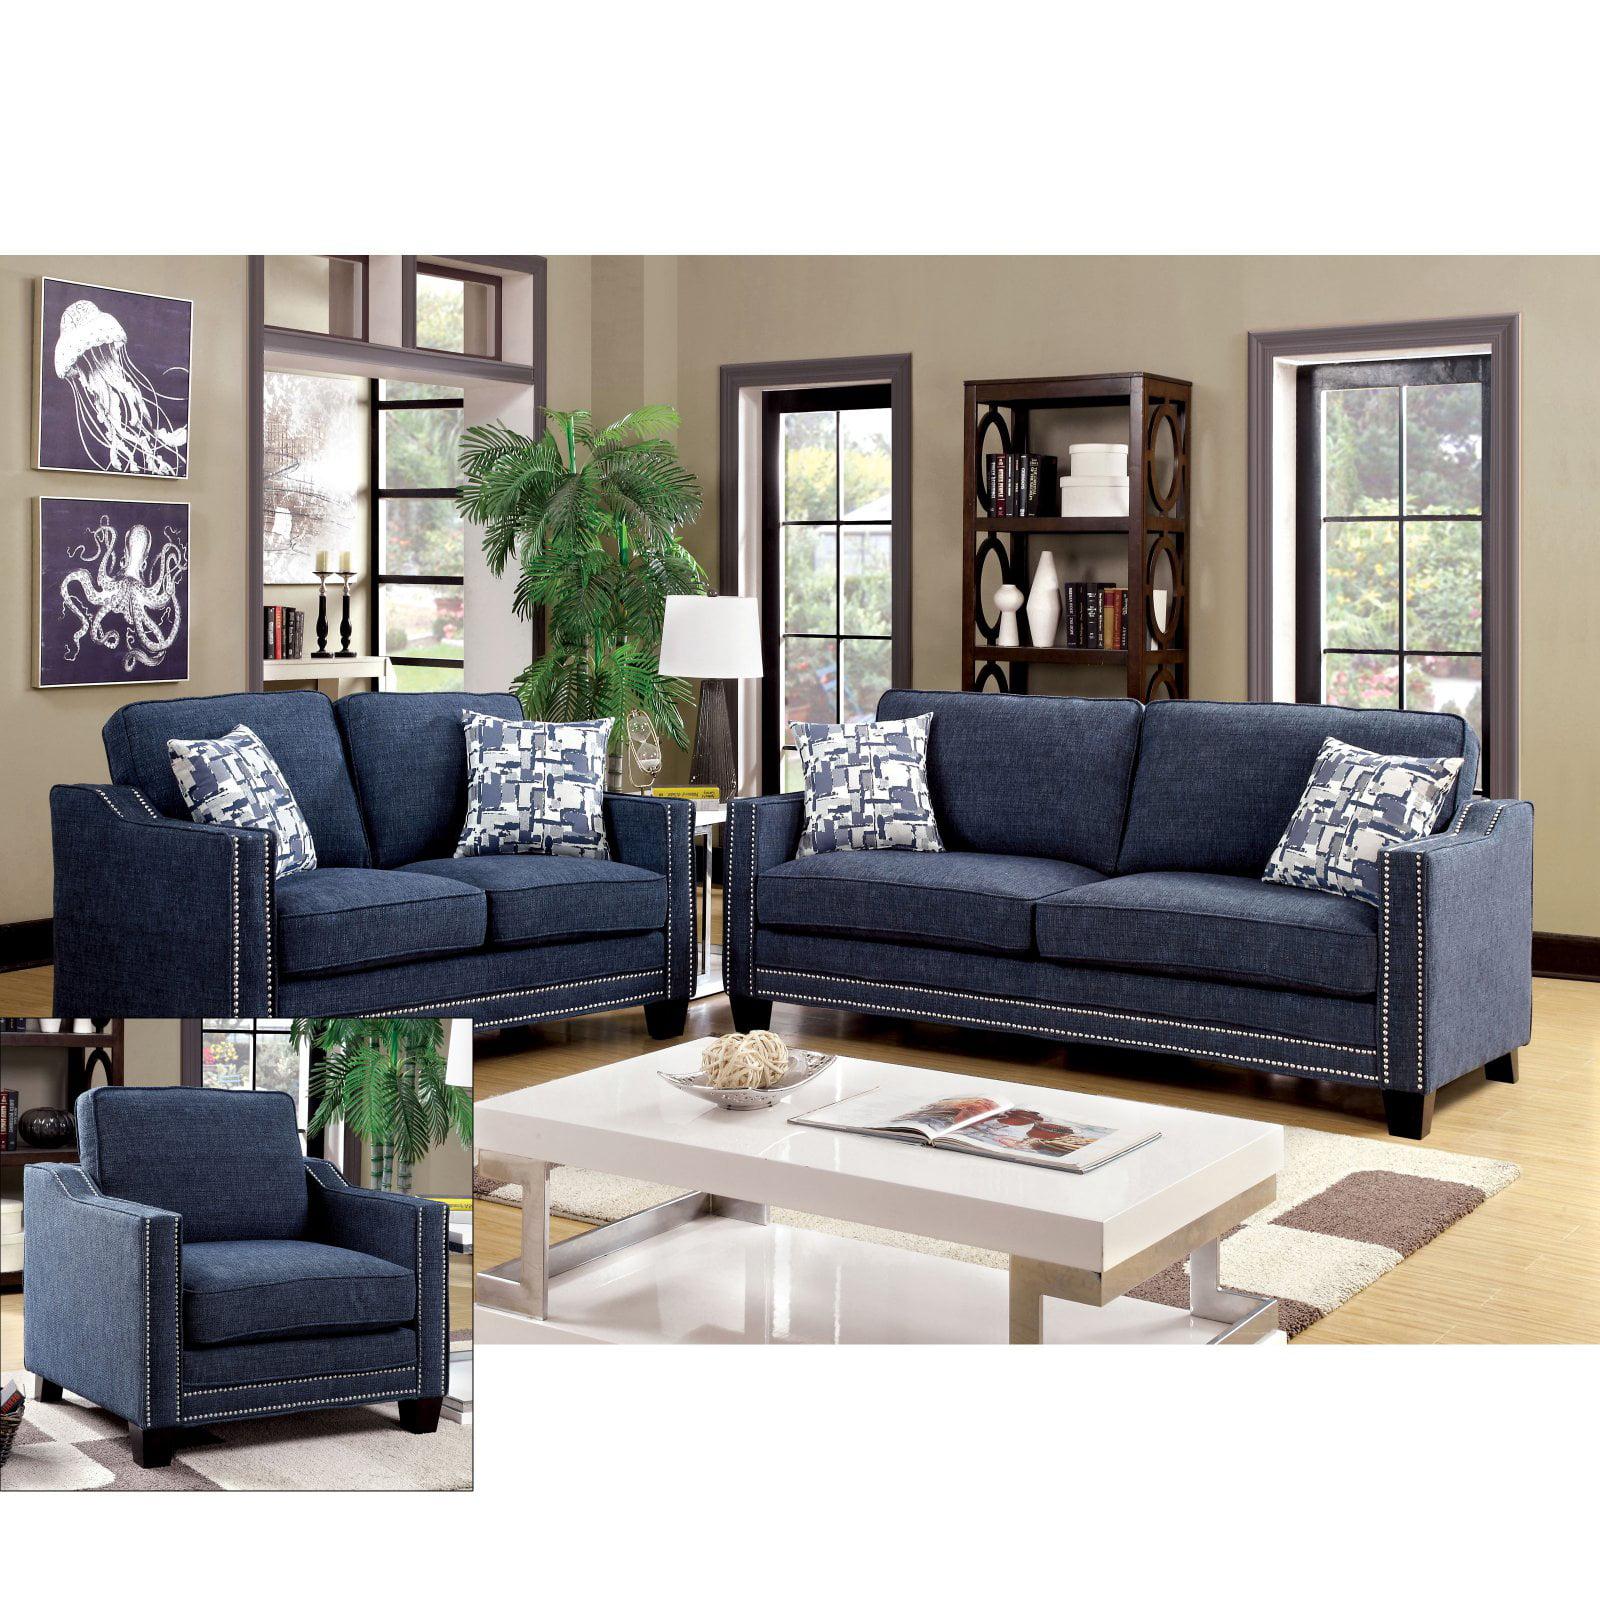 Furniture Of America Polin 3 Piece Studded Chenille Sofa Set